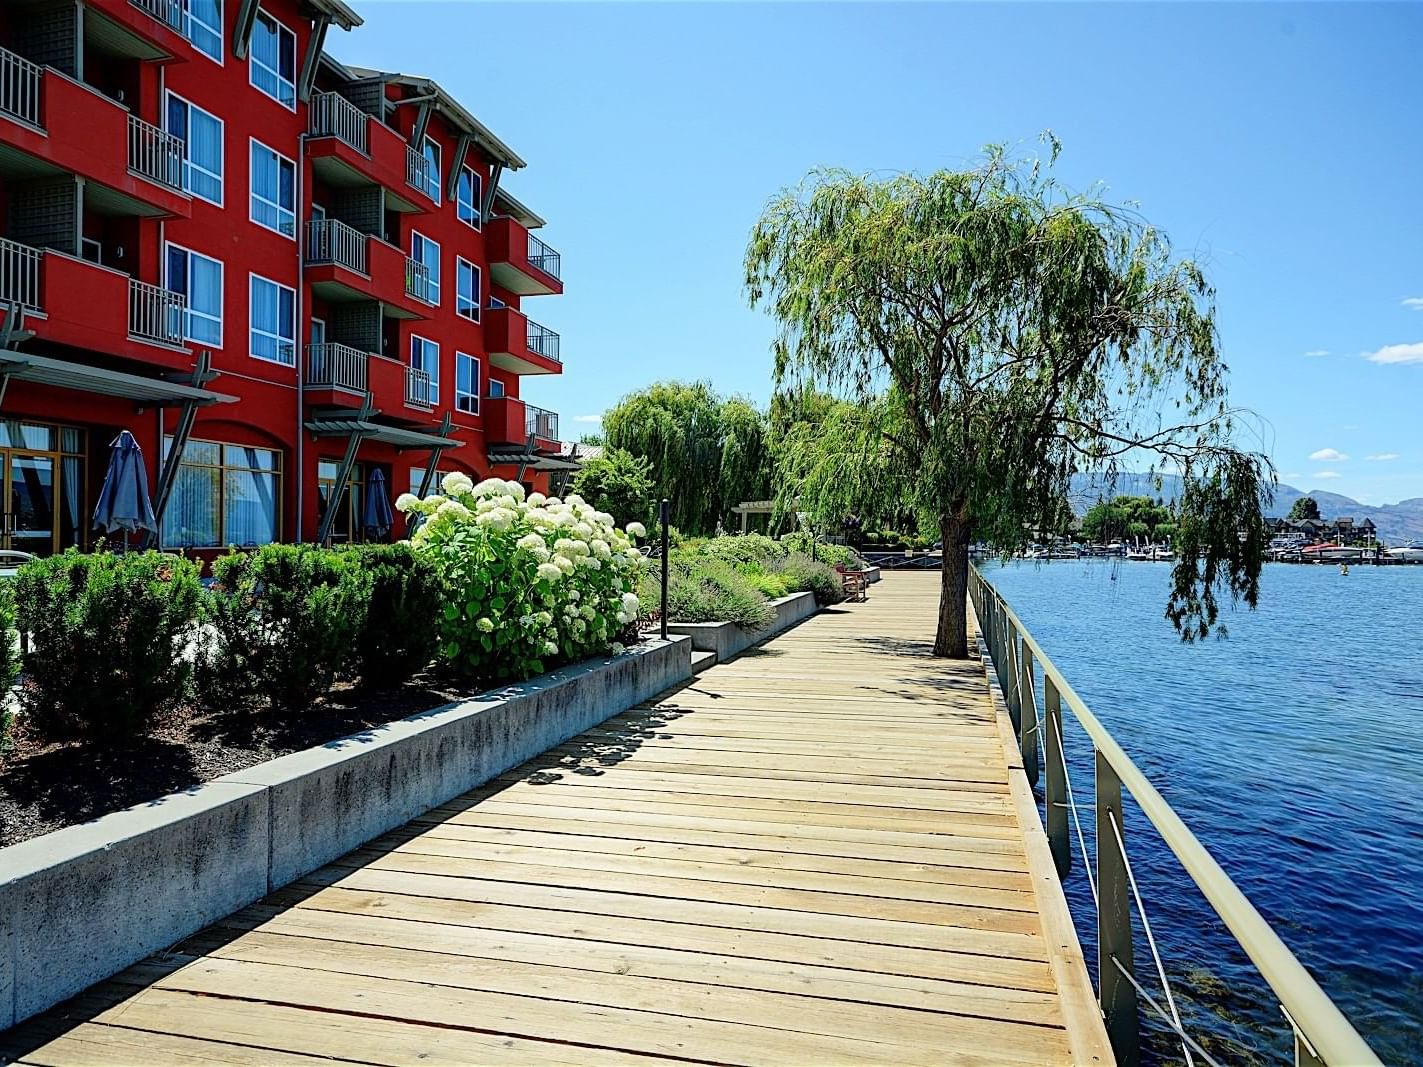 Boardwalk by the lake near Manteo Resort